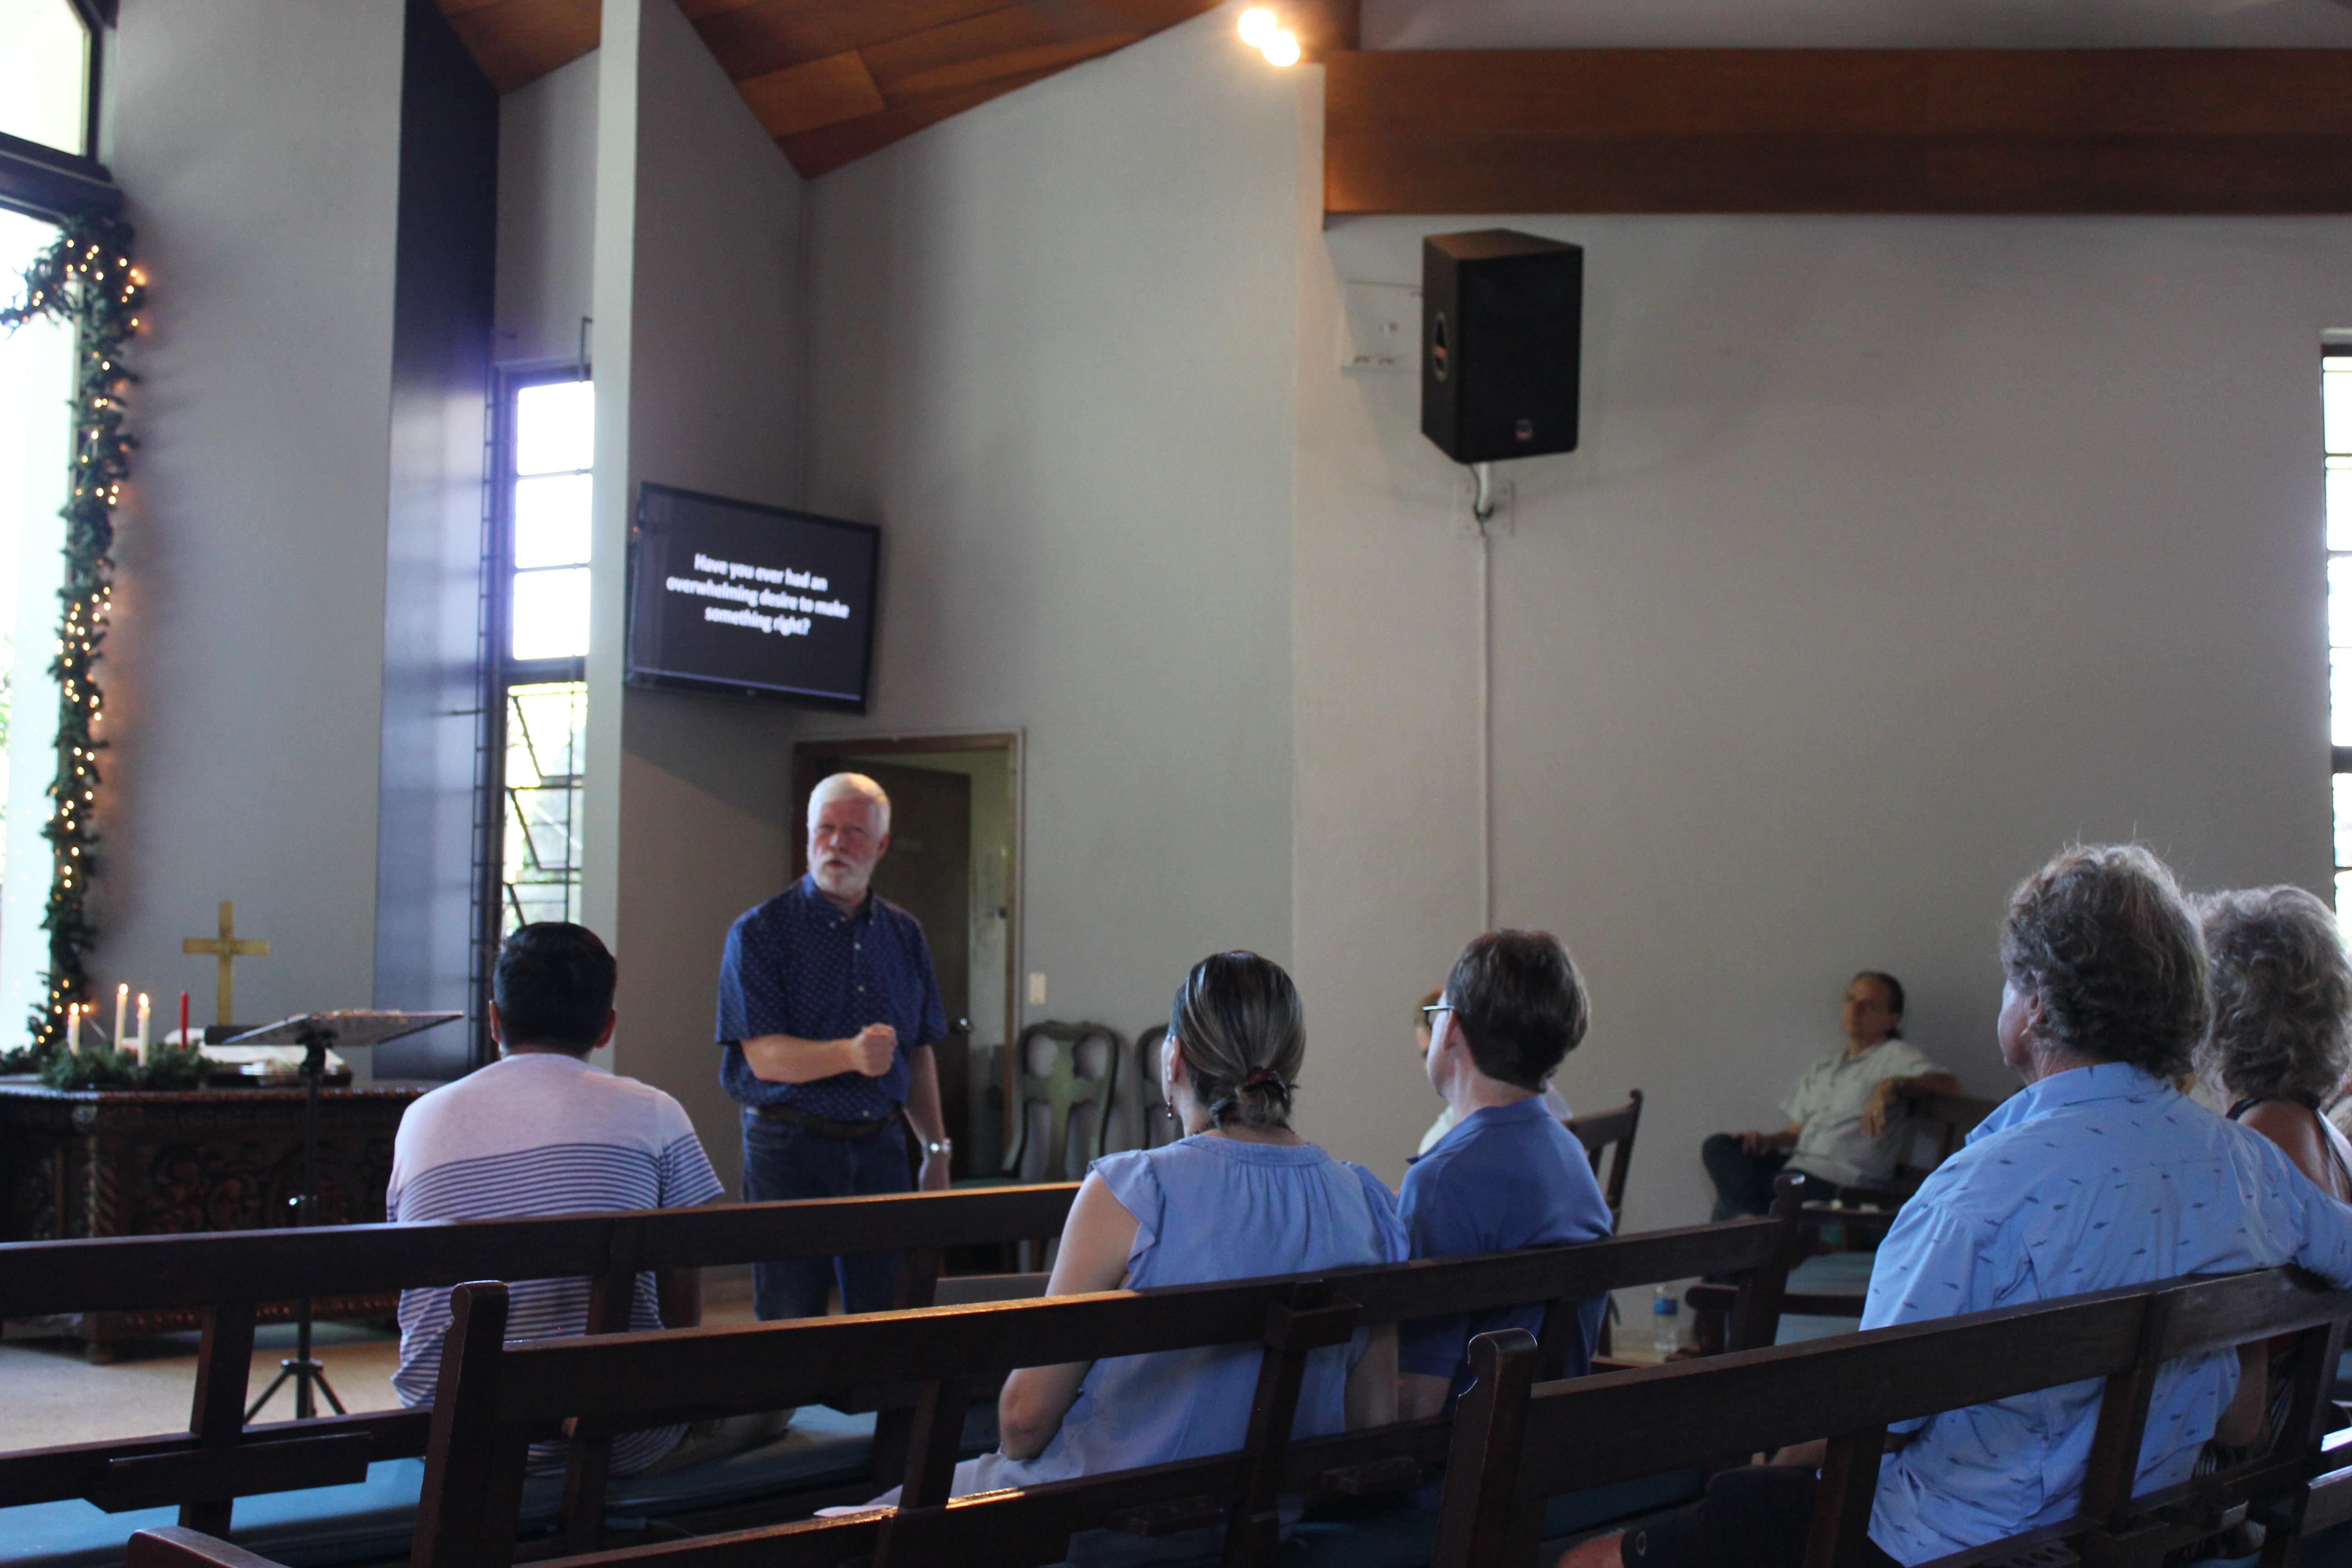 Pastor Gary preaching.